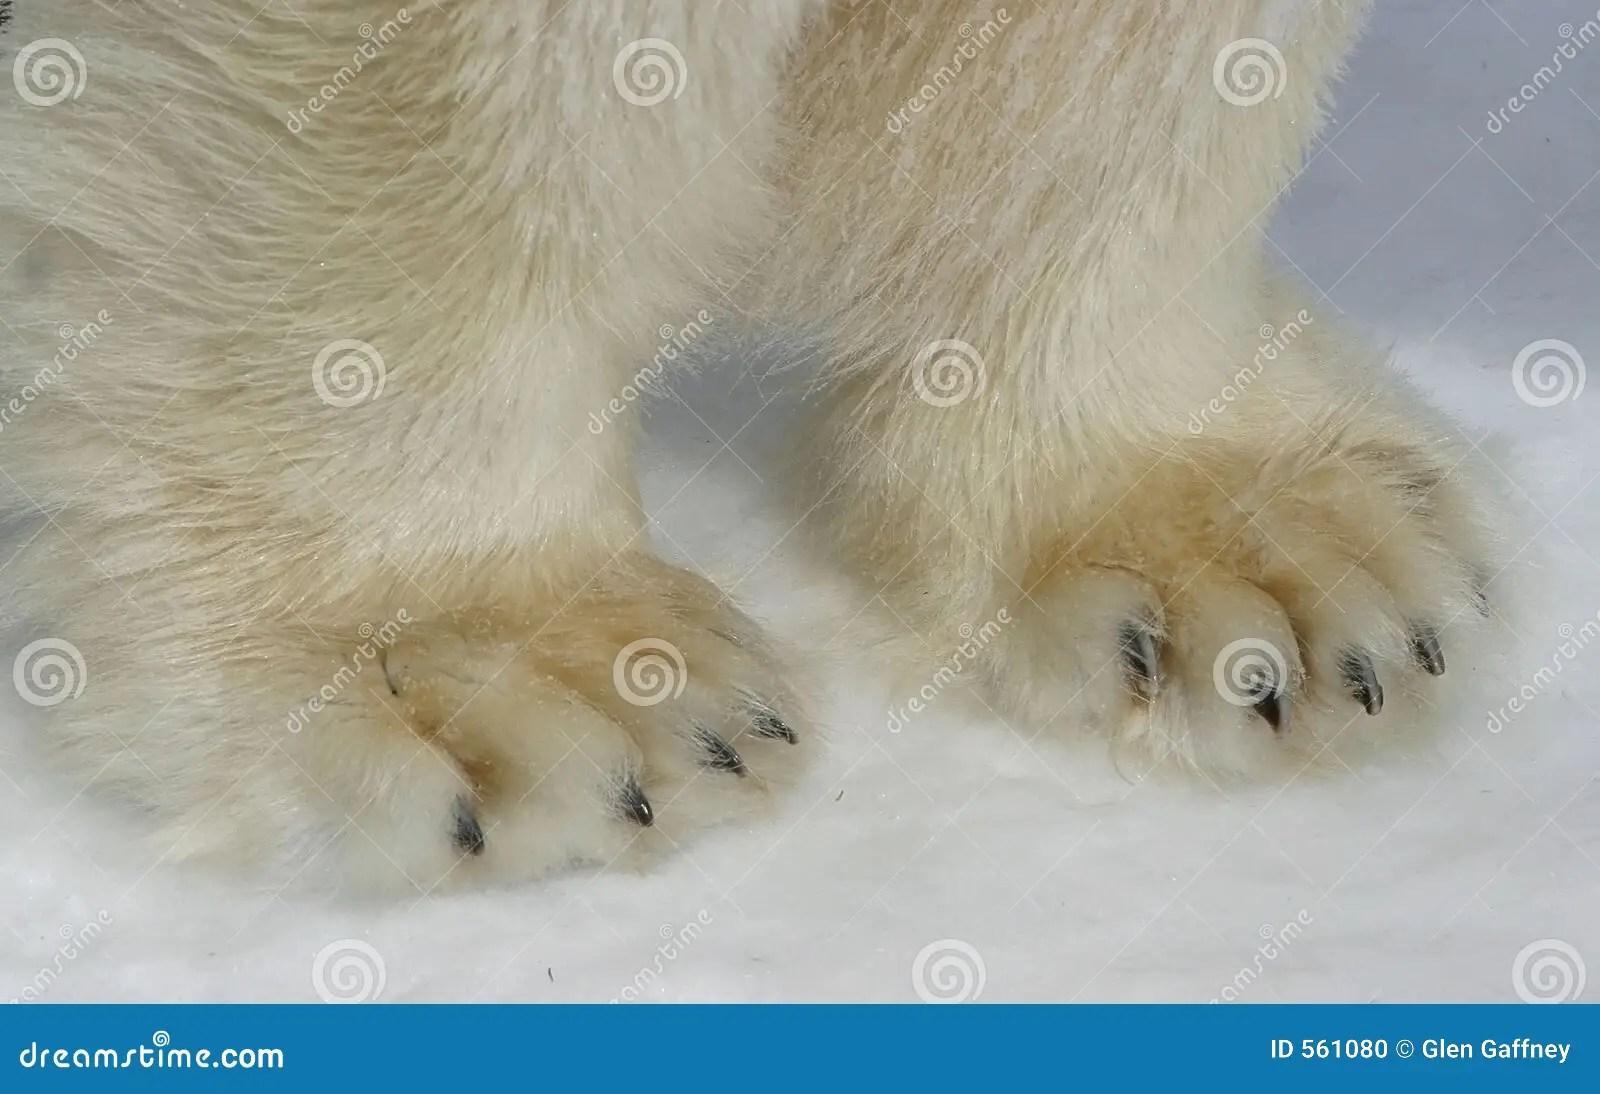 Polar Bear Paws Stock Photo Image Of Artic Bear Paws